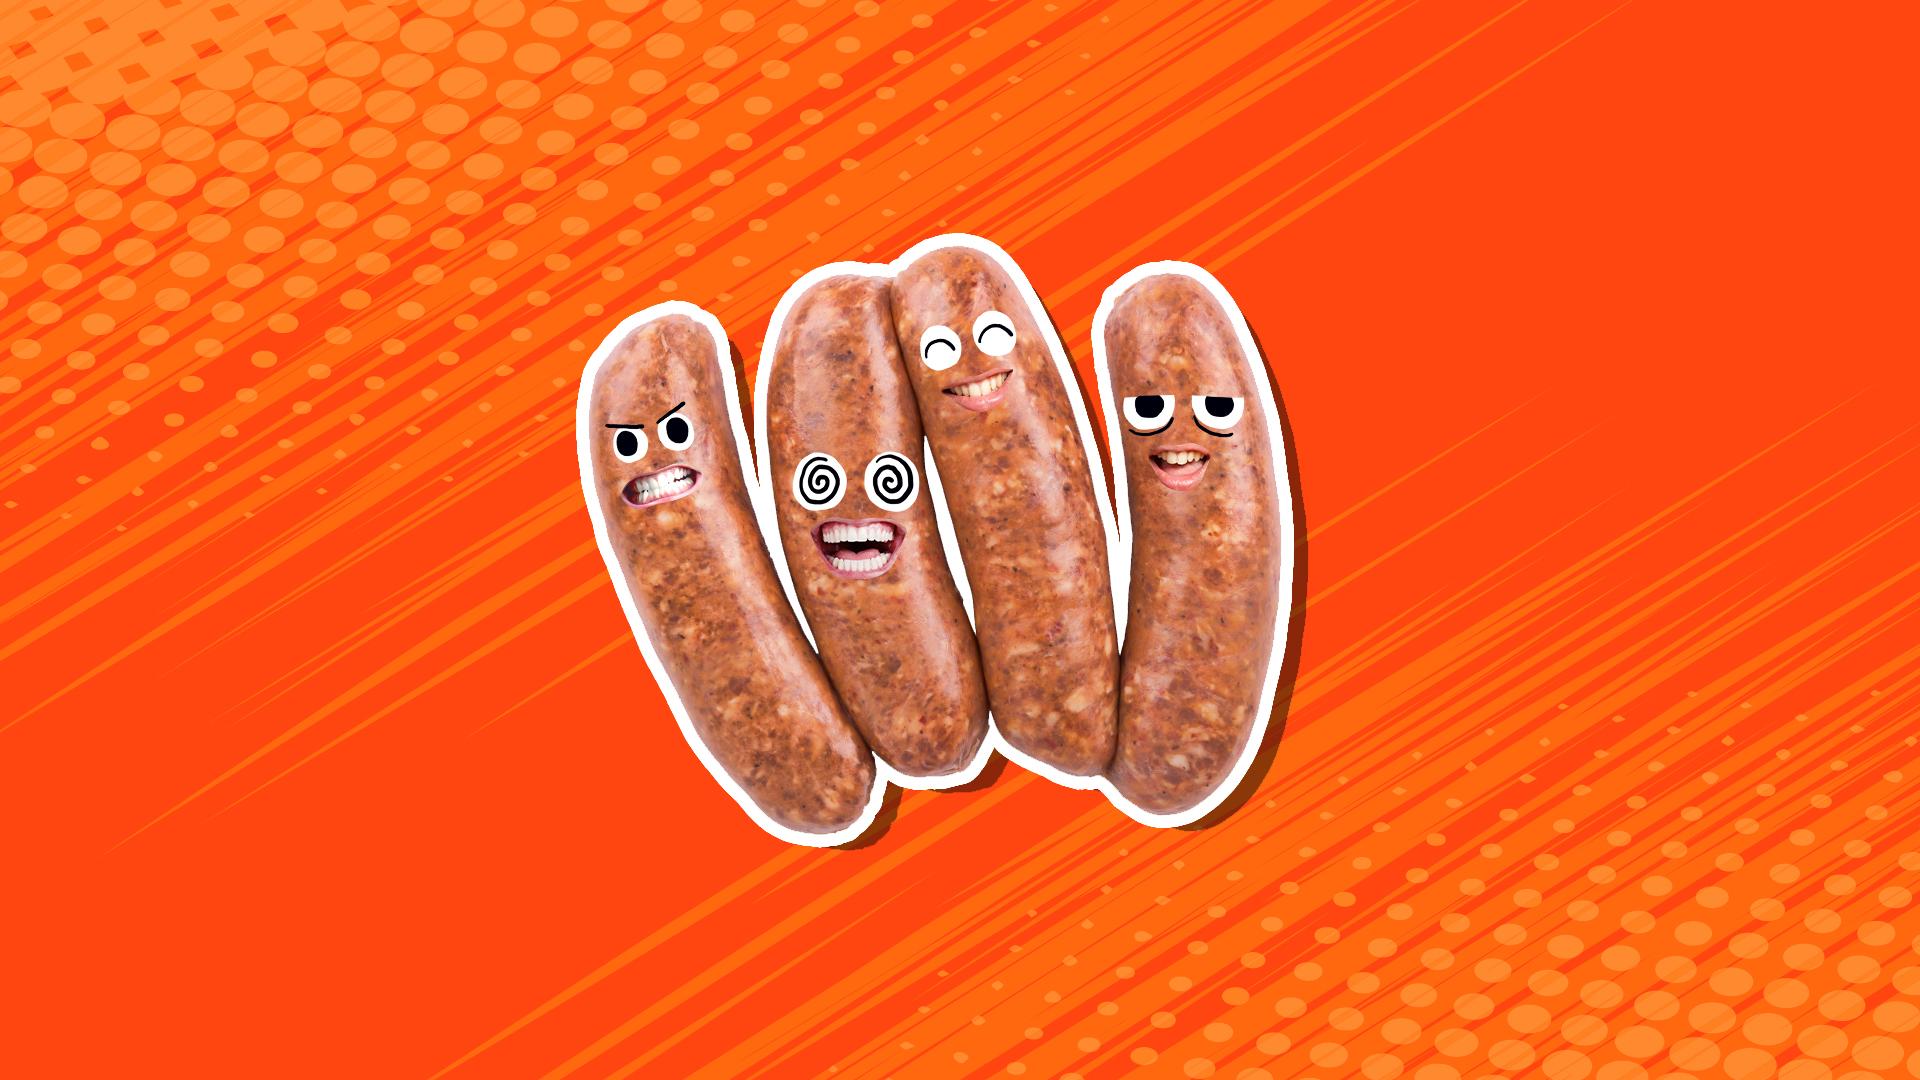 Four sausages laughing at a joke